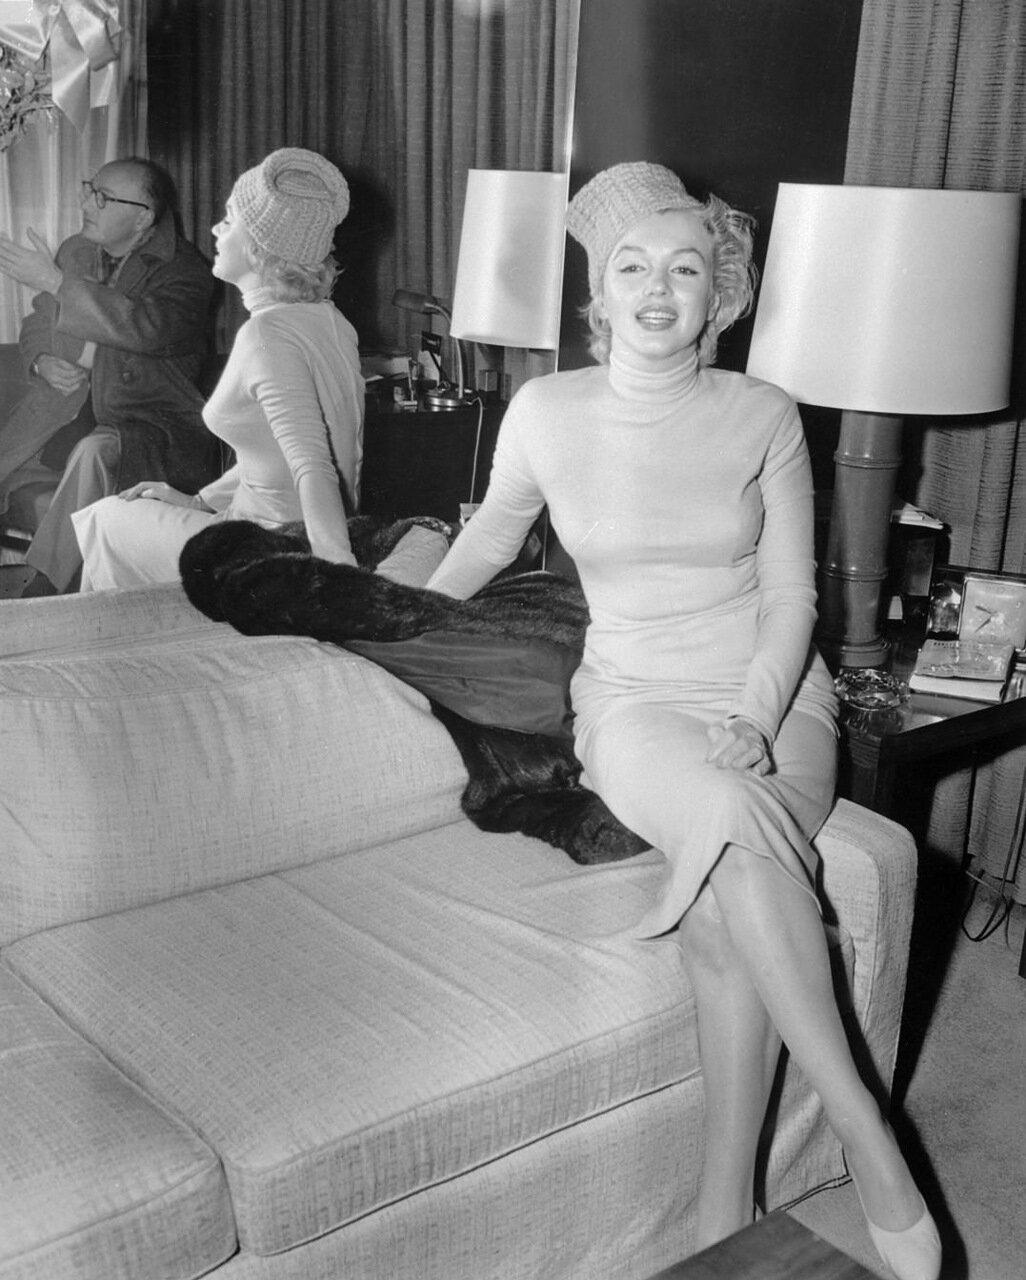 Marilyn Monroe Sitting on Arm of Sofa